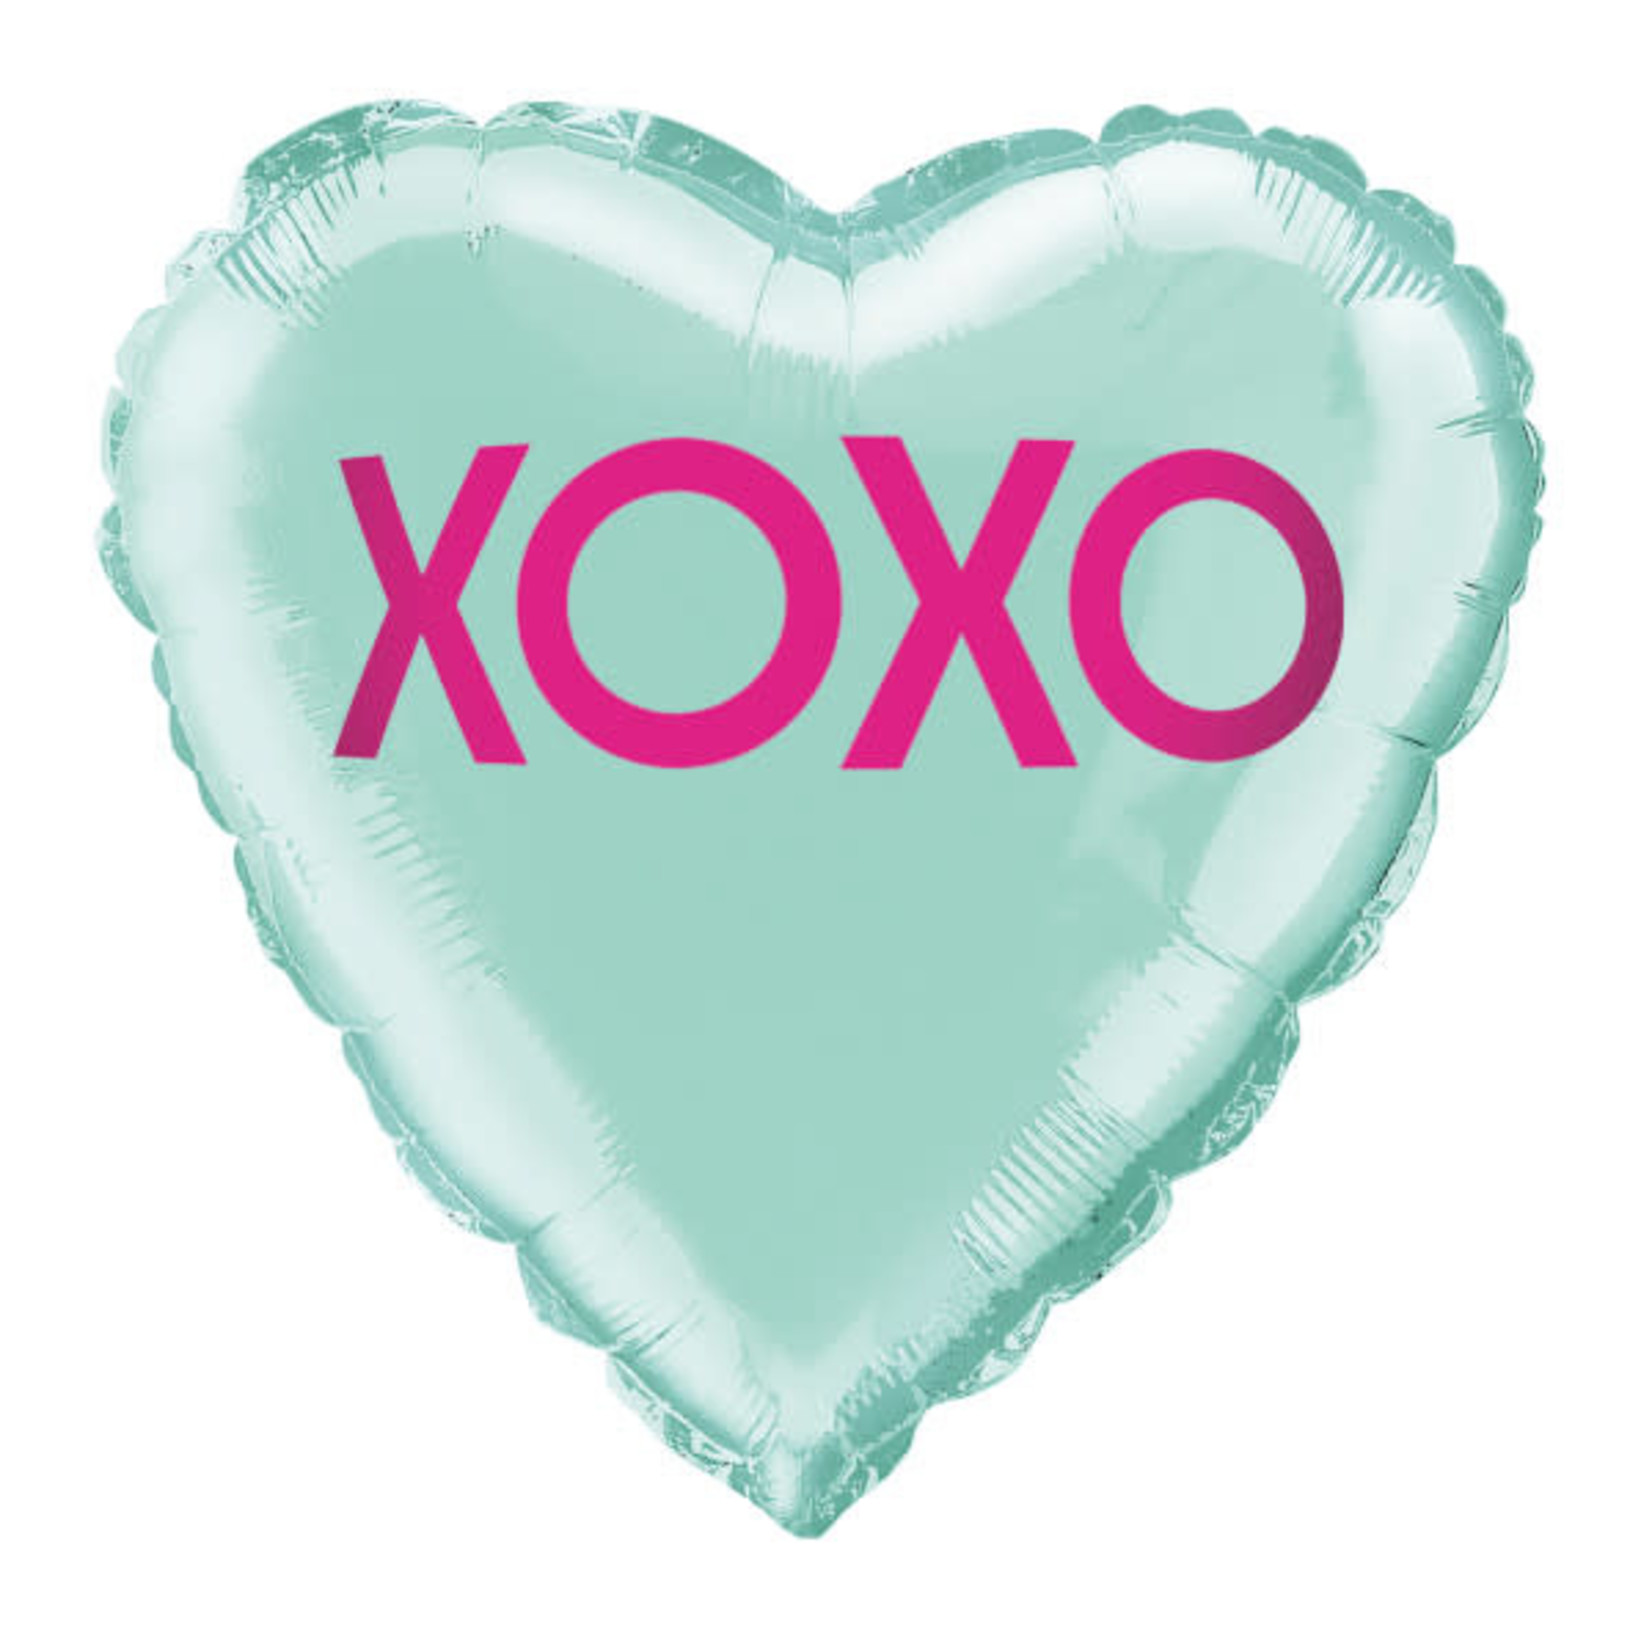 18'' XOXO TEAL HEART BALLOON